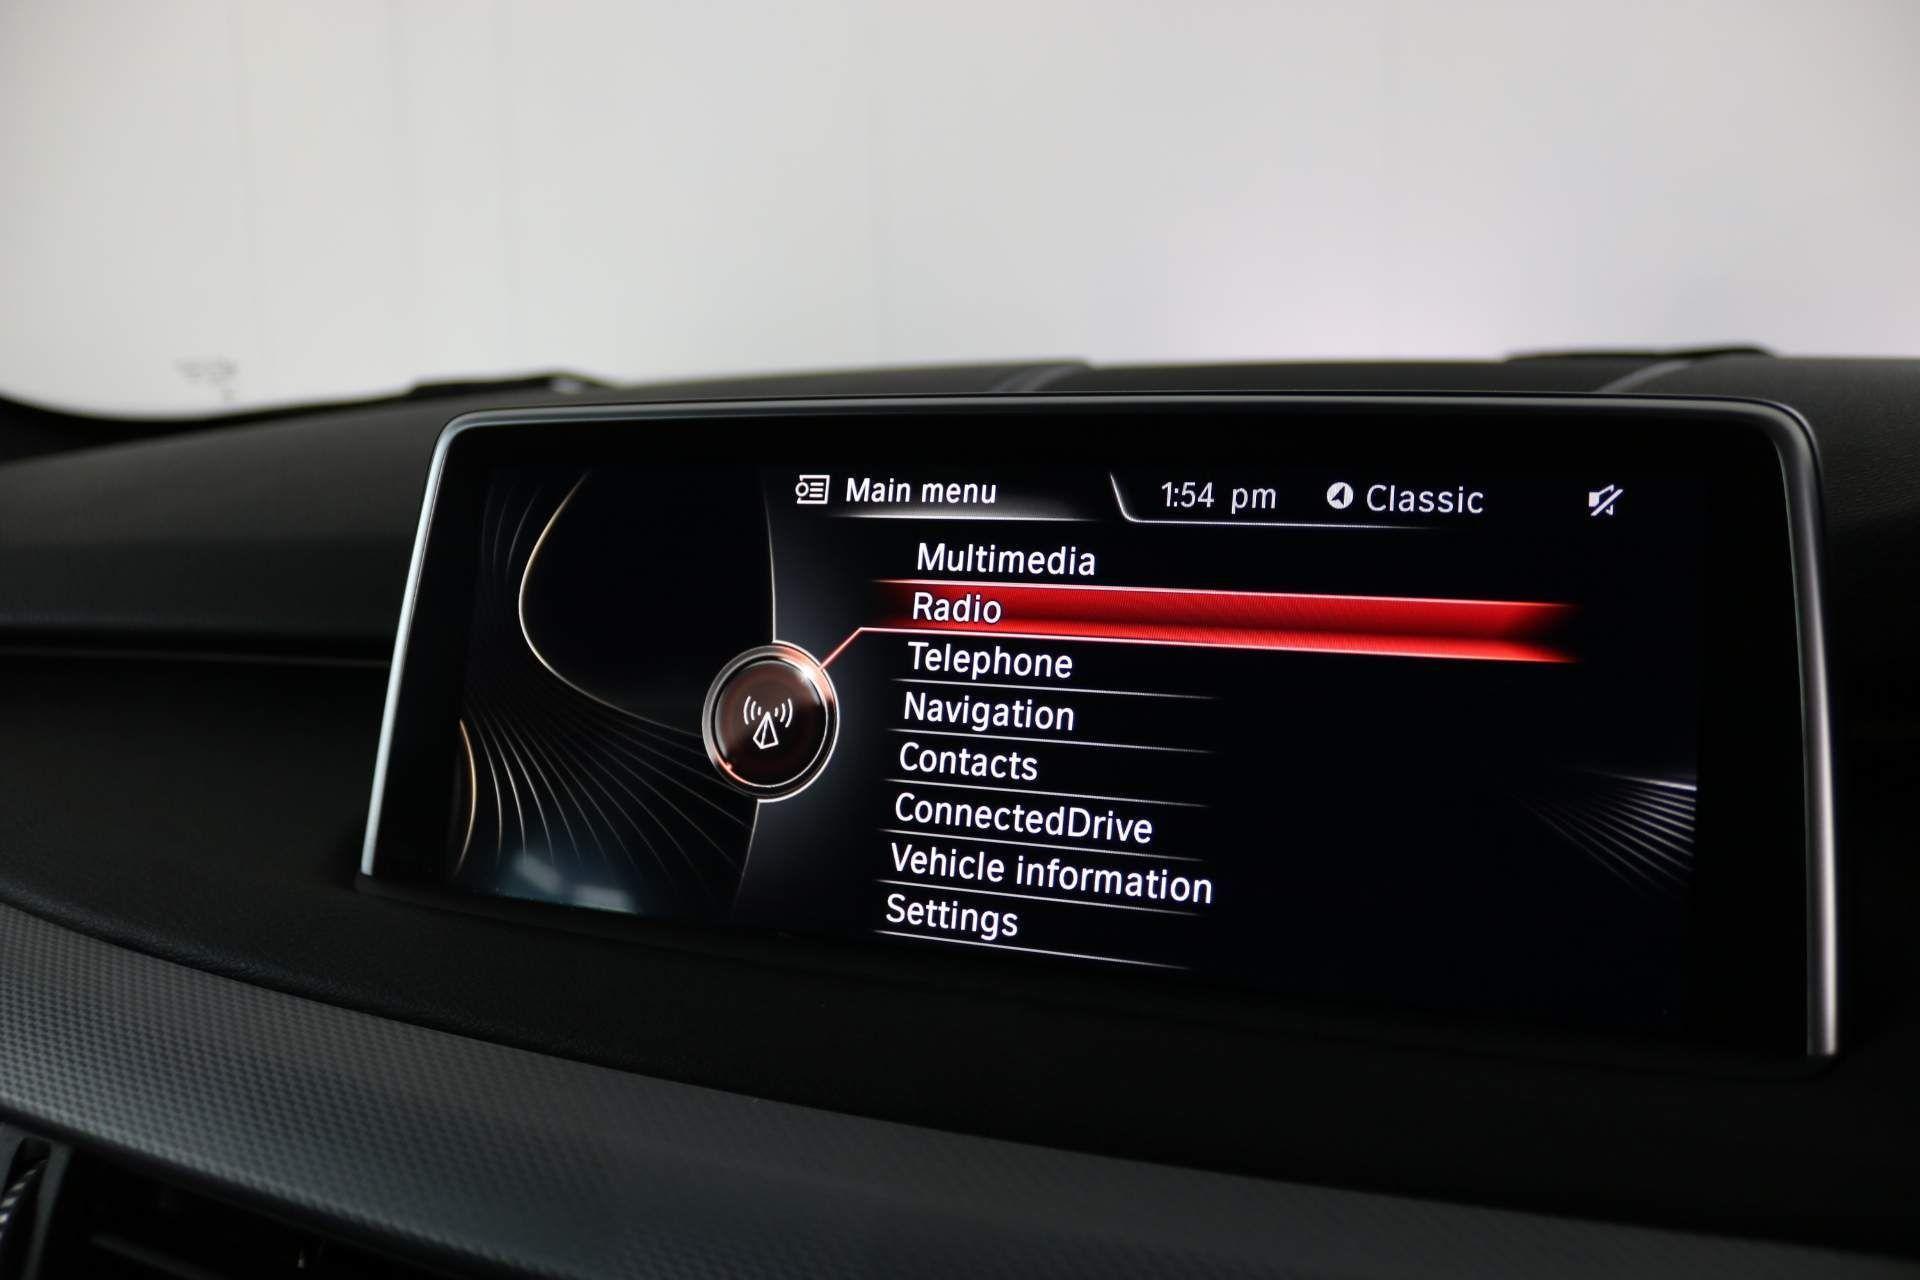 "BMW X5 3.0d xDrive""Auto"" Special Equipment - 15 Reg - 7 Seater -Leather - Sat Nav -Mega Spec- No Vat - Image 12 of 13"